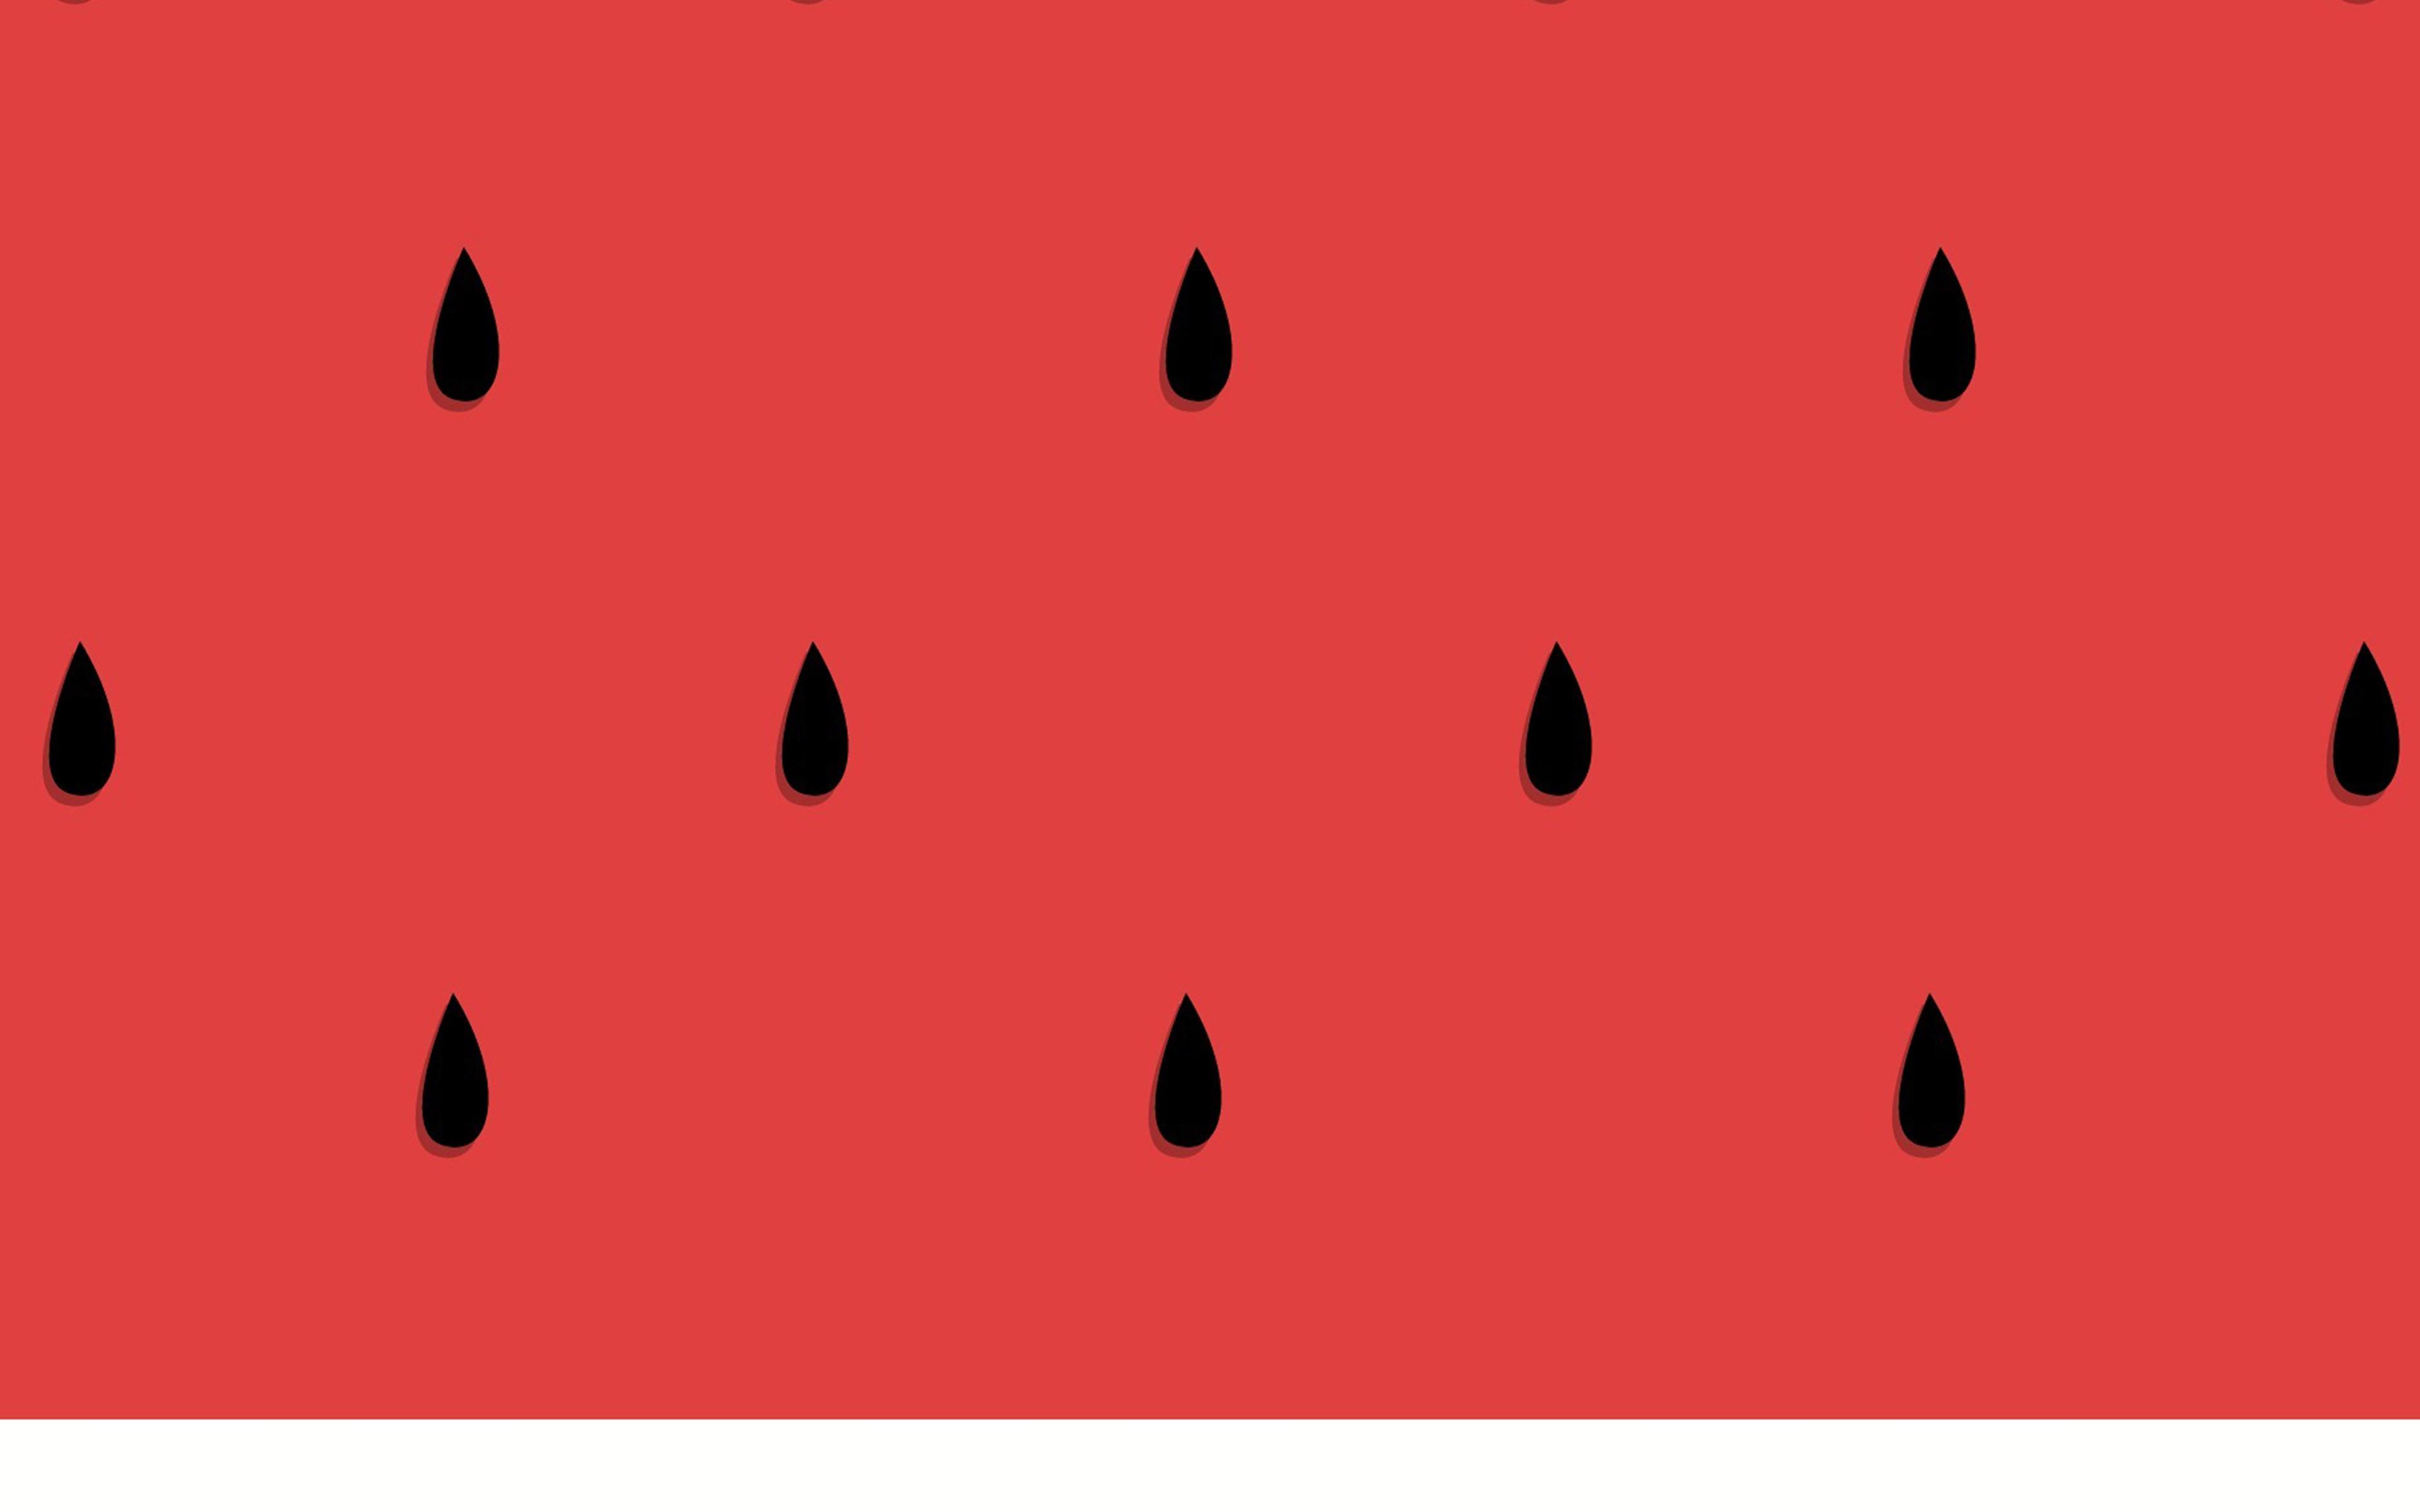 Cute Summer Iphone Wallpapers: Af46-watermelon-minimal-art